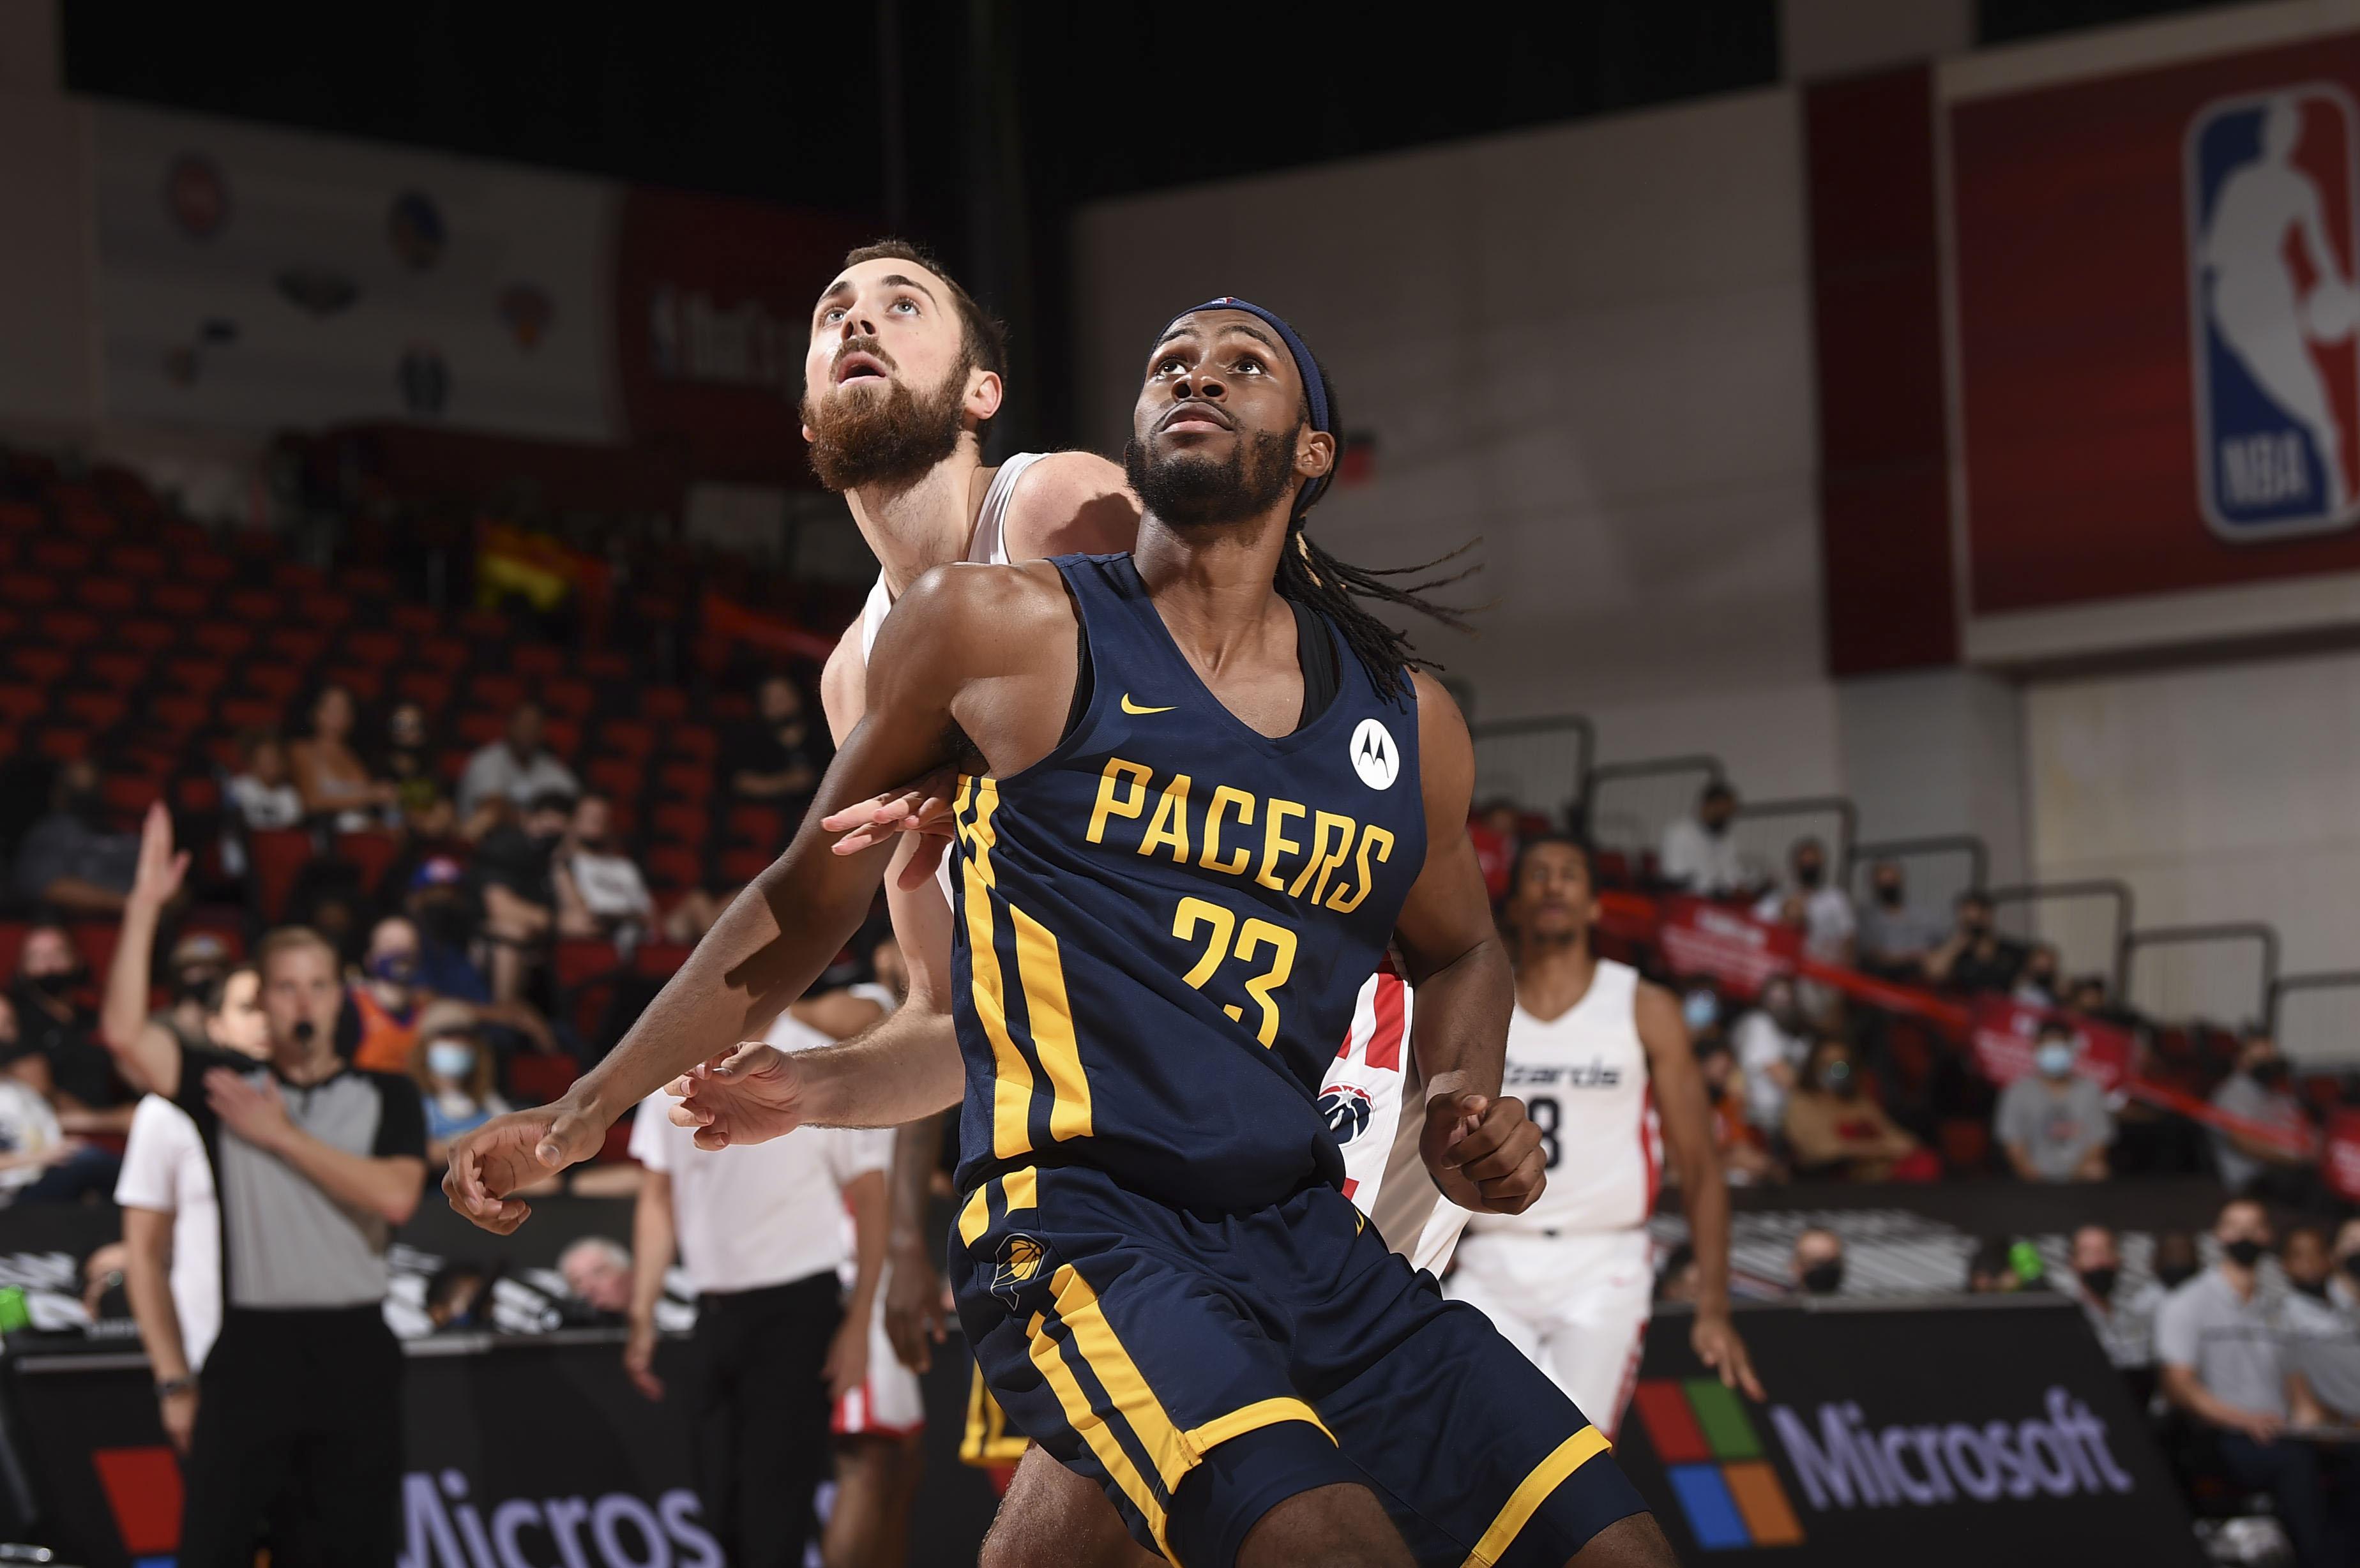 2021 Las Vegas Summer League - Indiana Pacers v Washington Wizards